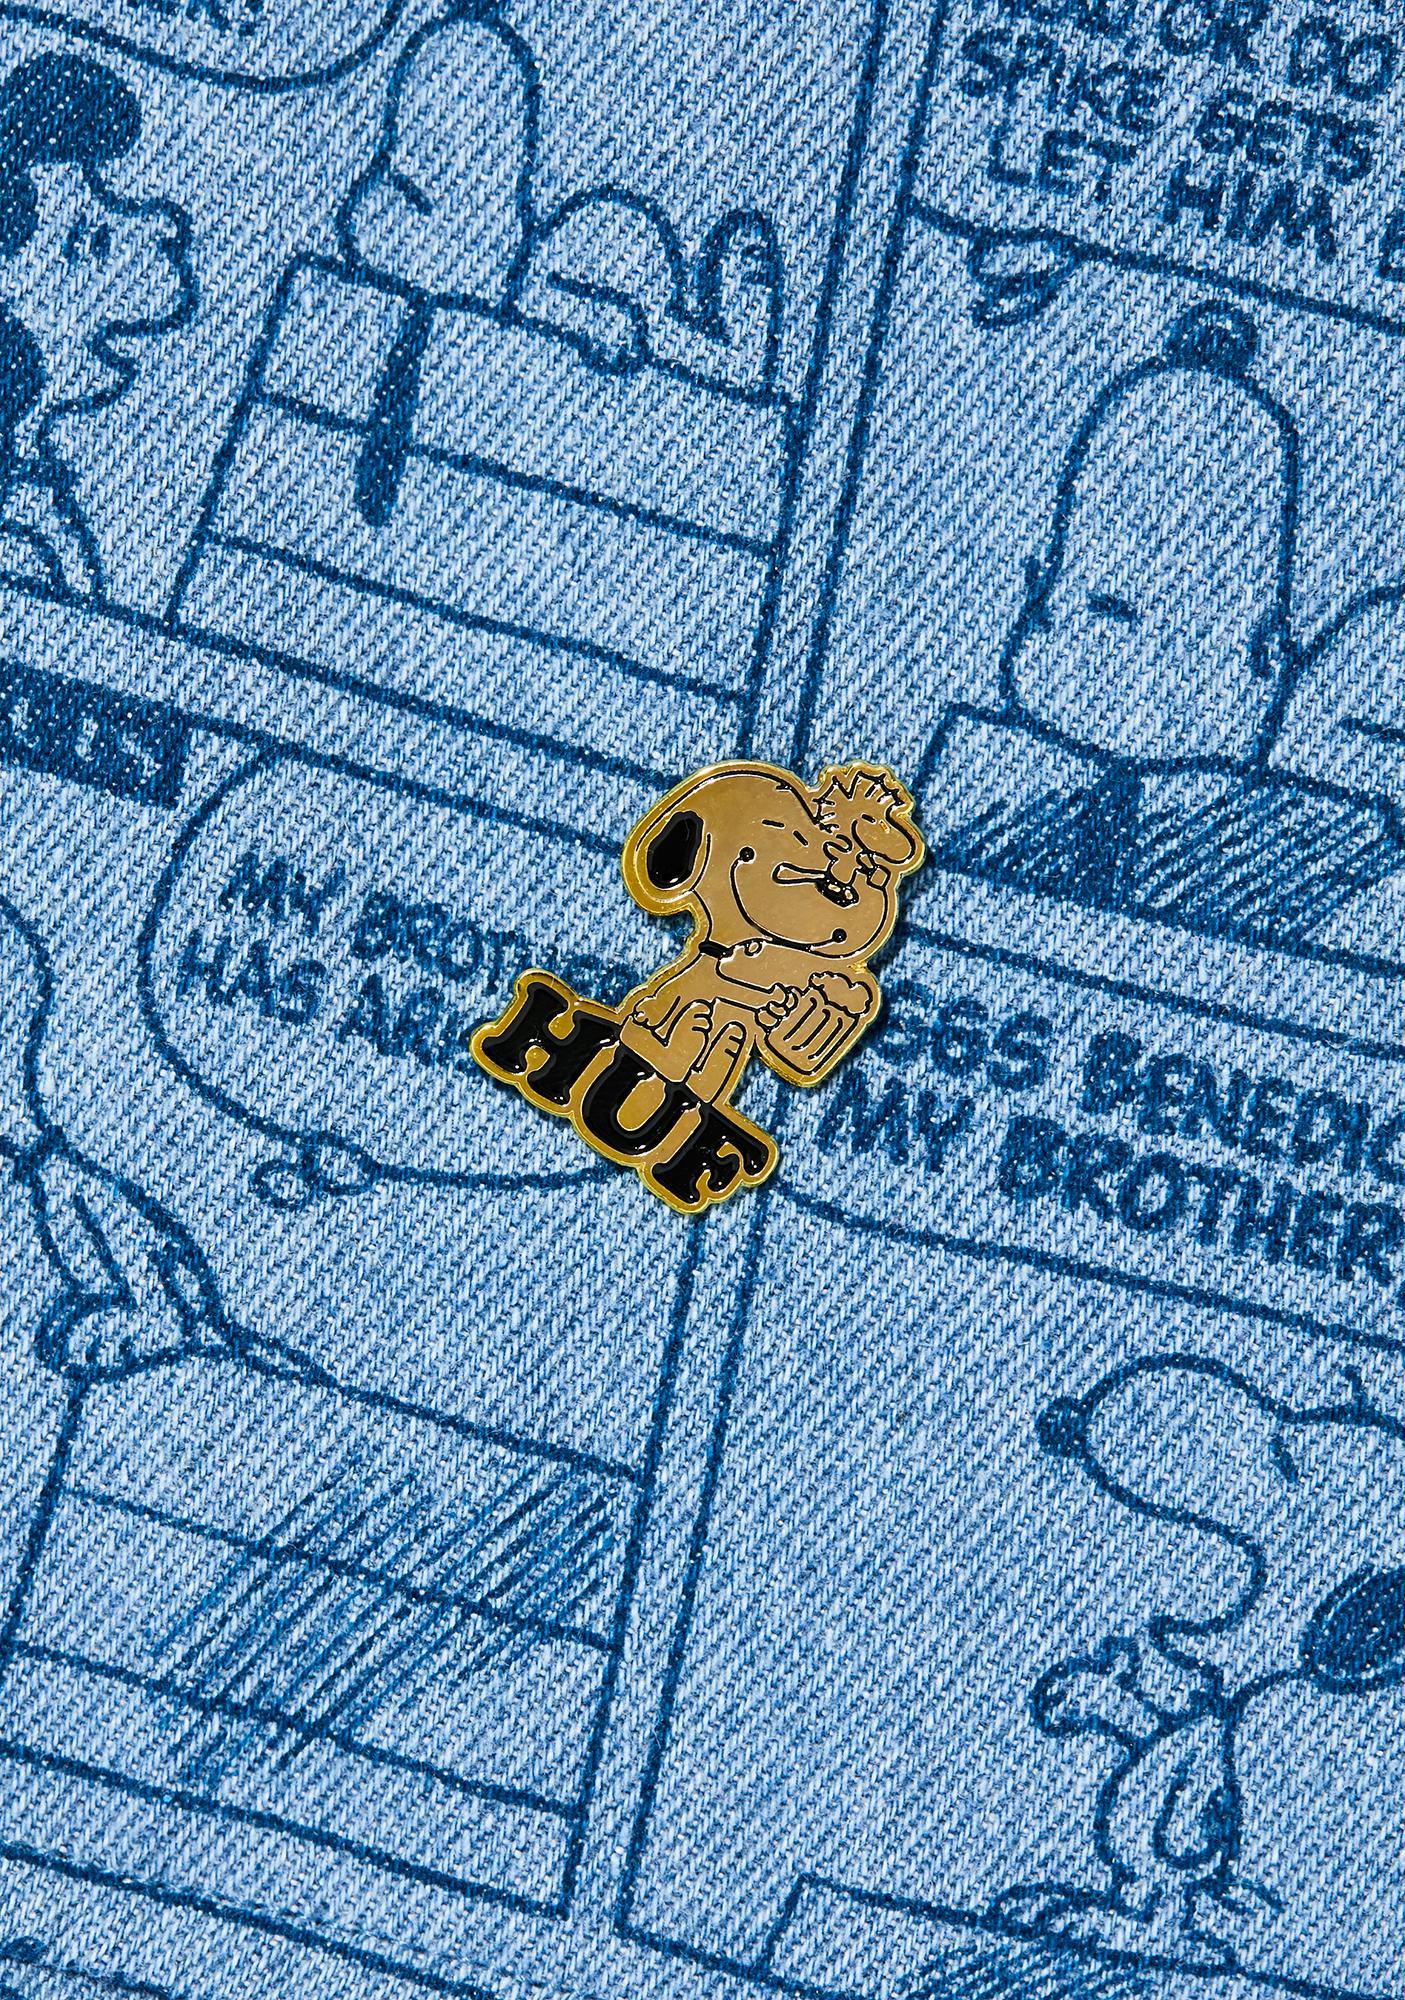 HUF Peanuts Enamel Pin